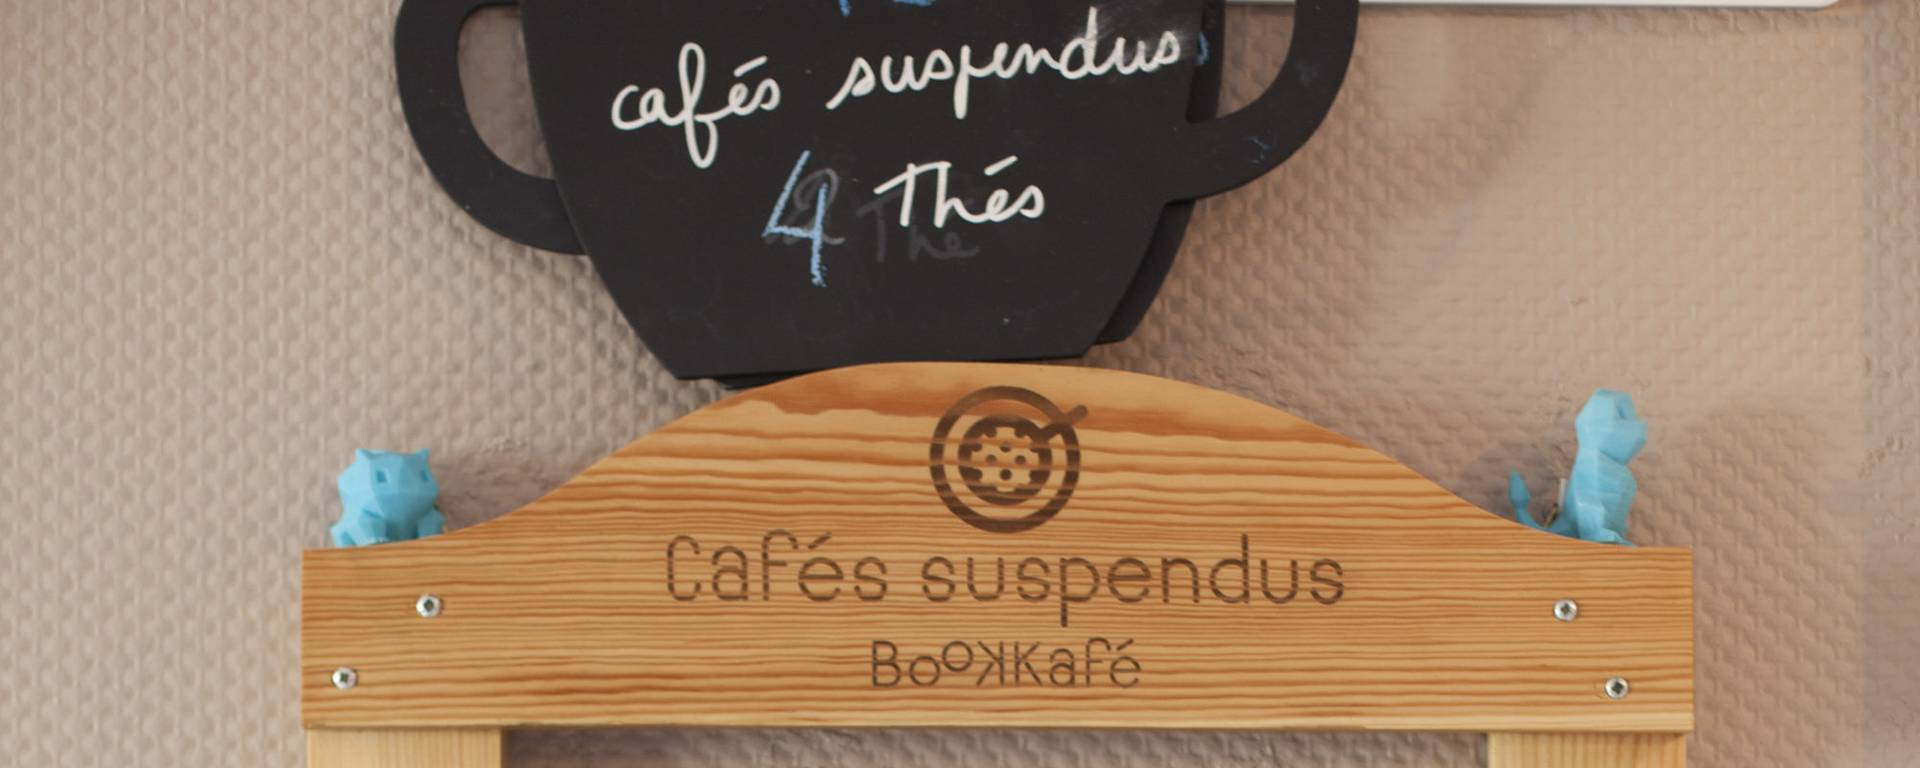 "Les "" Cafés suspendus "" © Brigitte Baudesson"